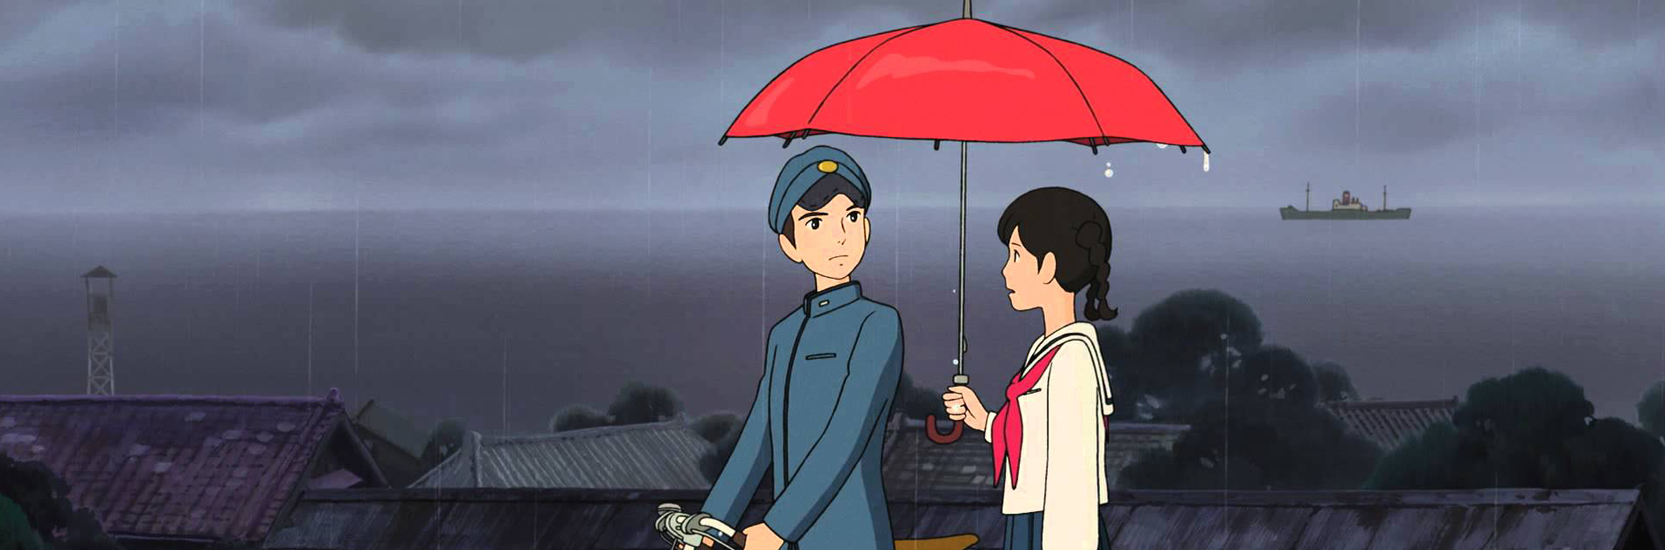 Les prochains Ghibli et Miyazaki !